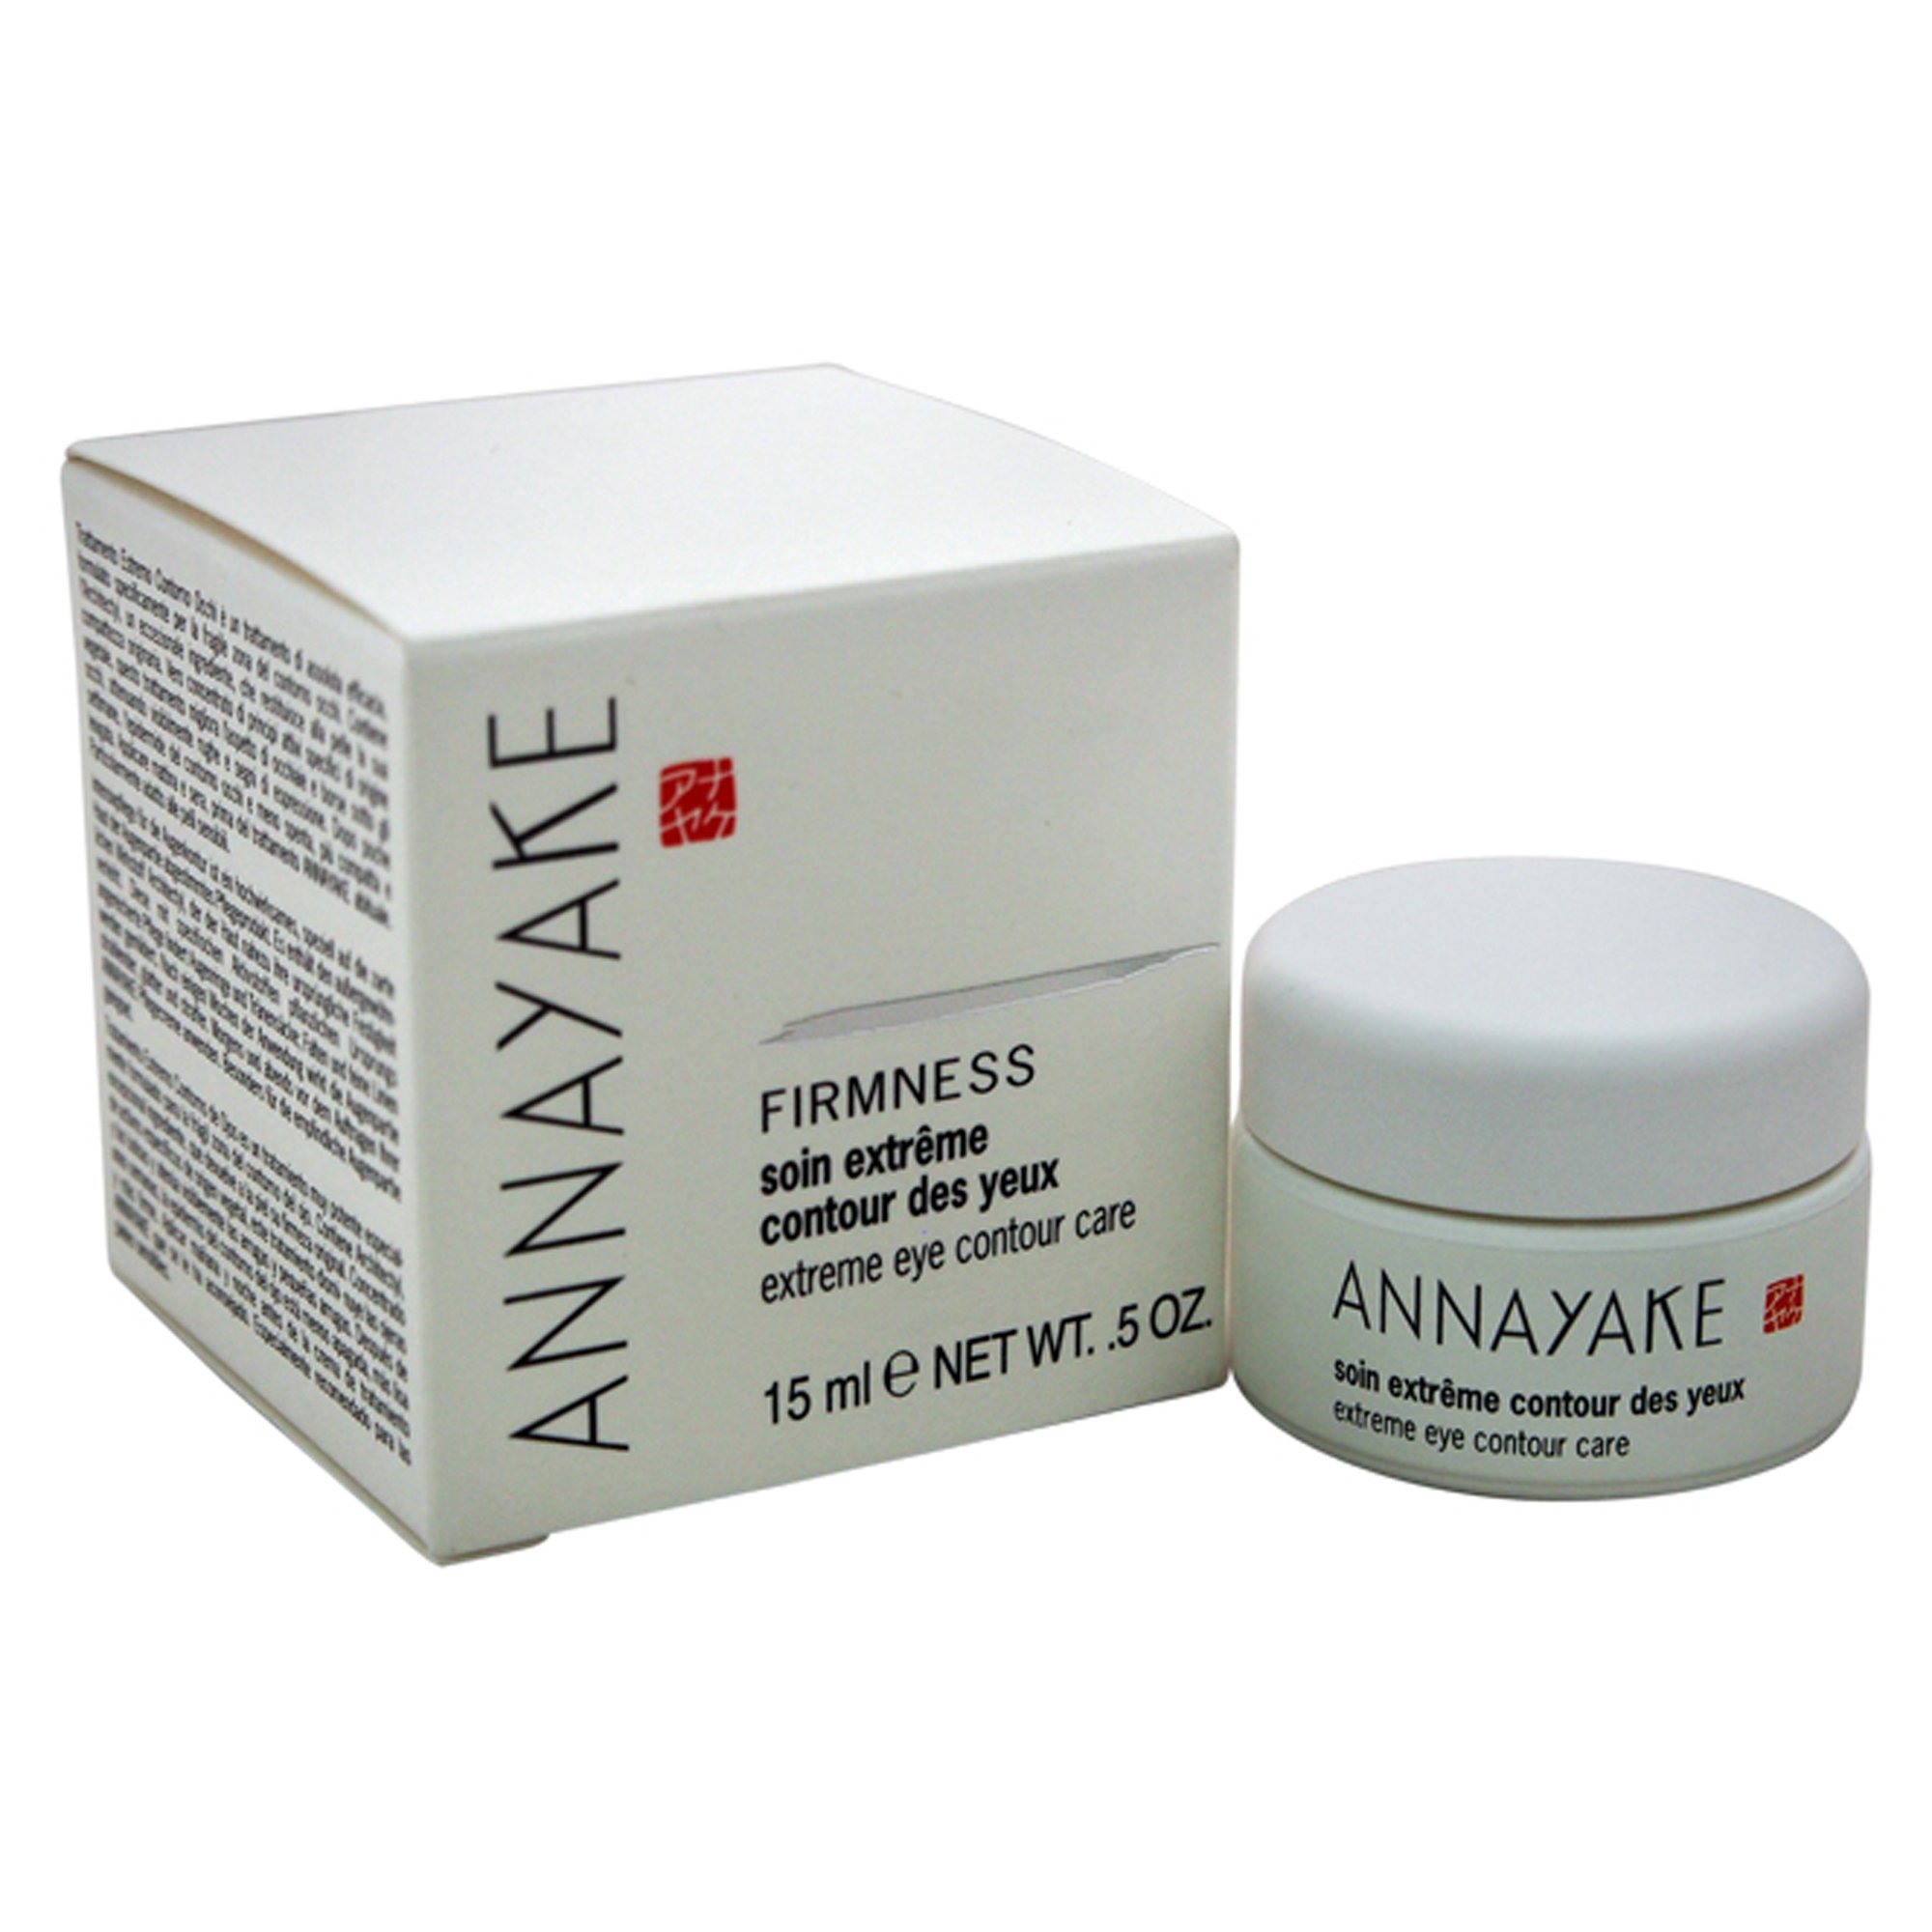 Annayake Extreme Eye Contour Care Sensitive Skin Treatment for Women, 0.5 Ounce